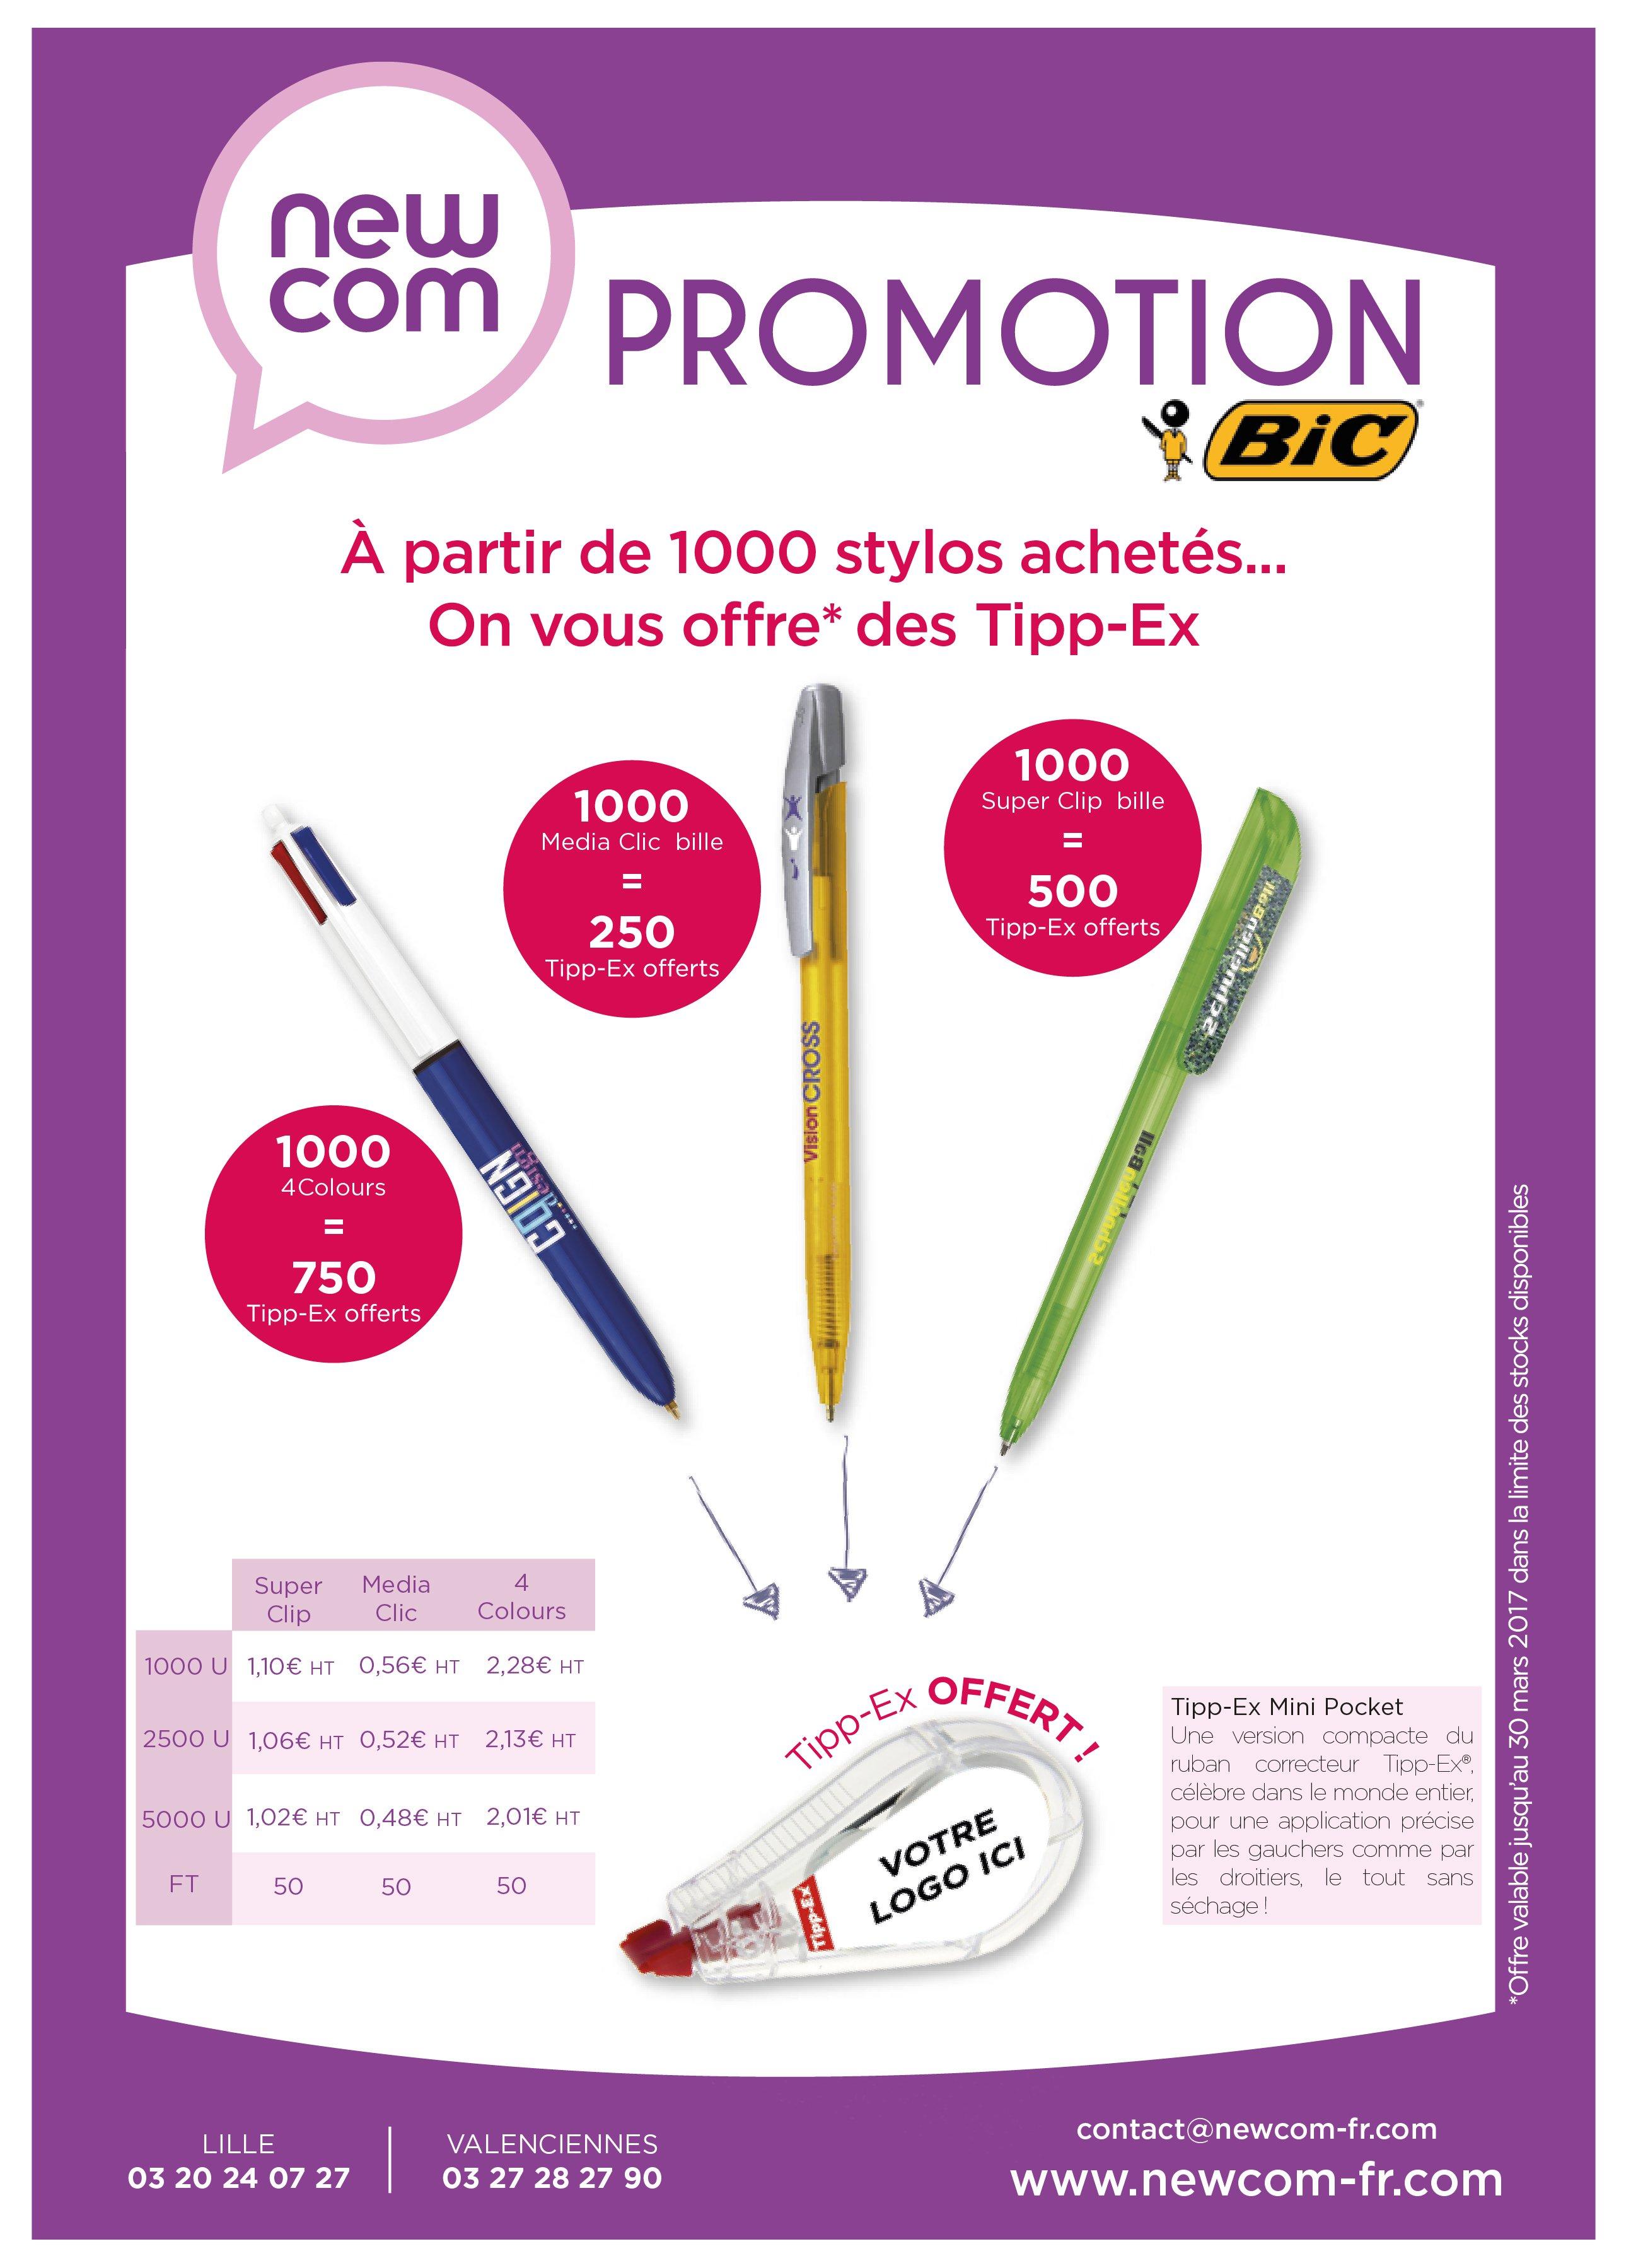 promotion BIC New com